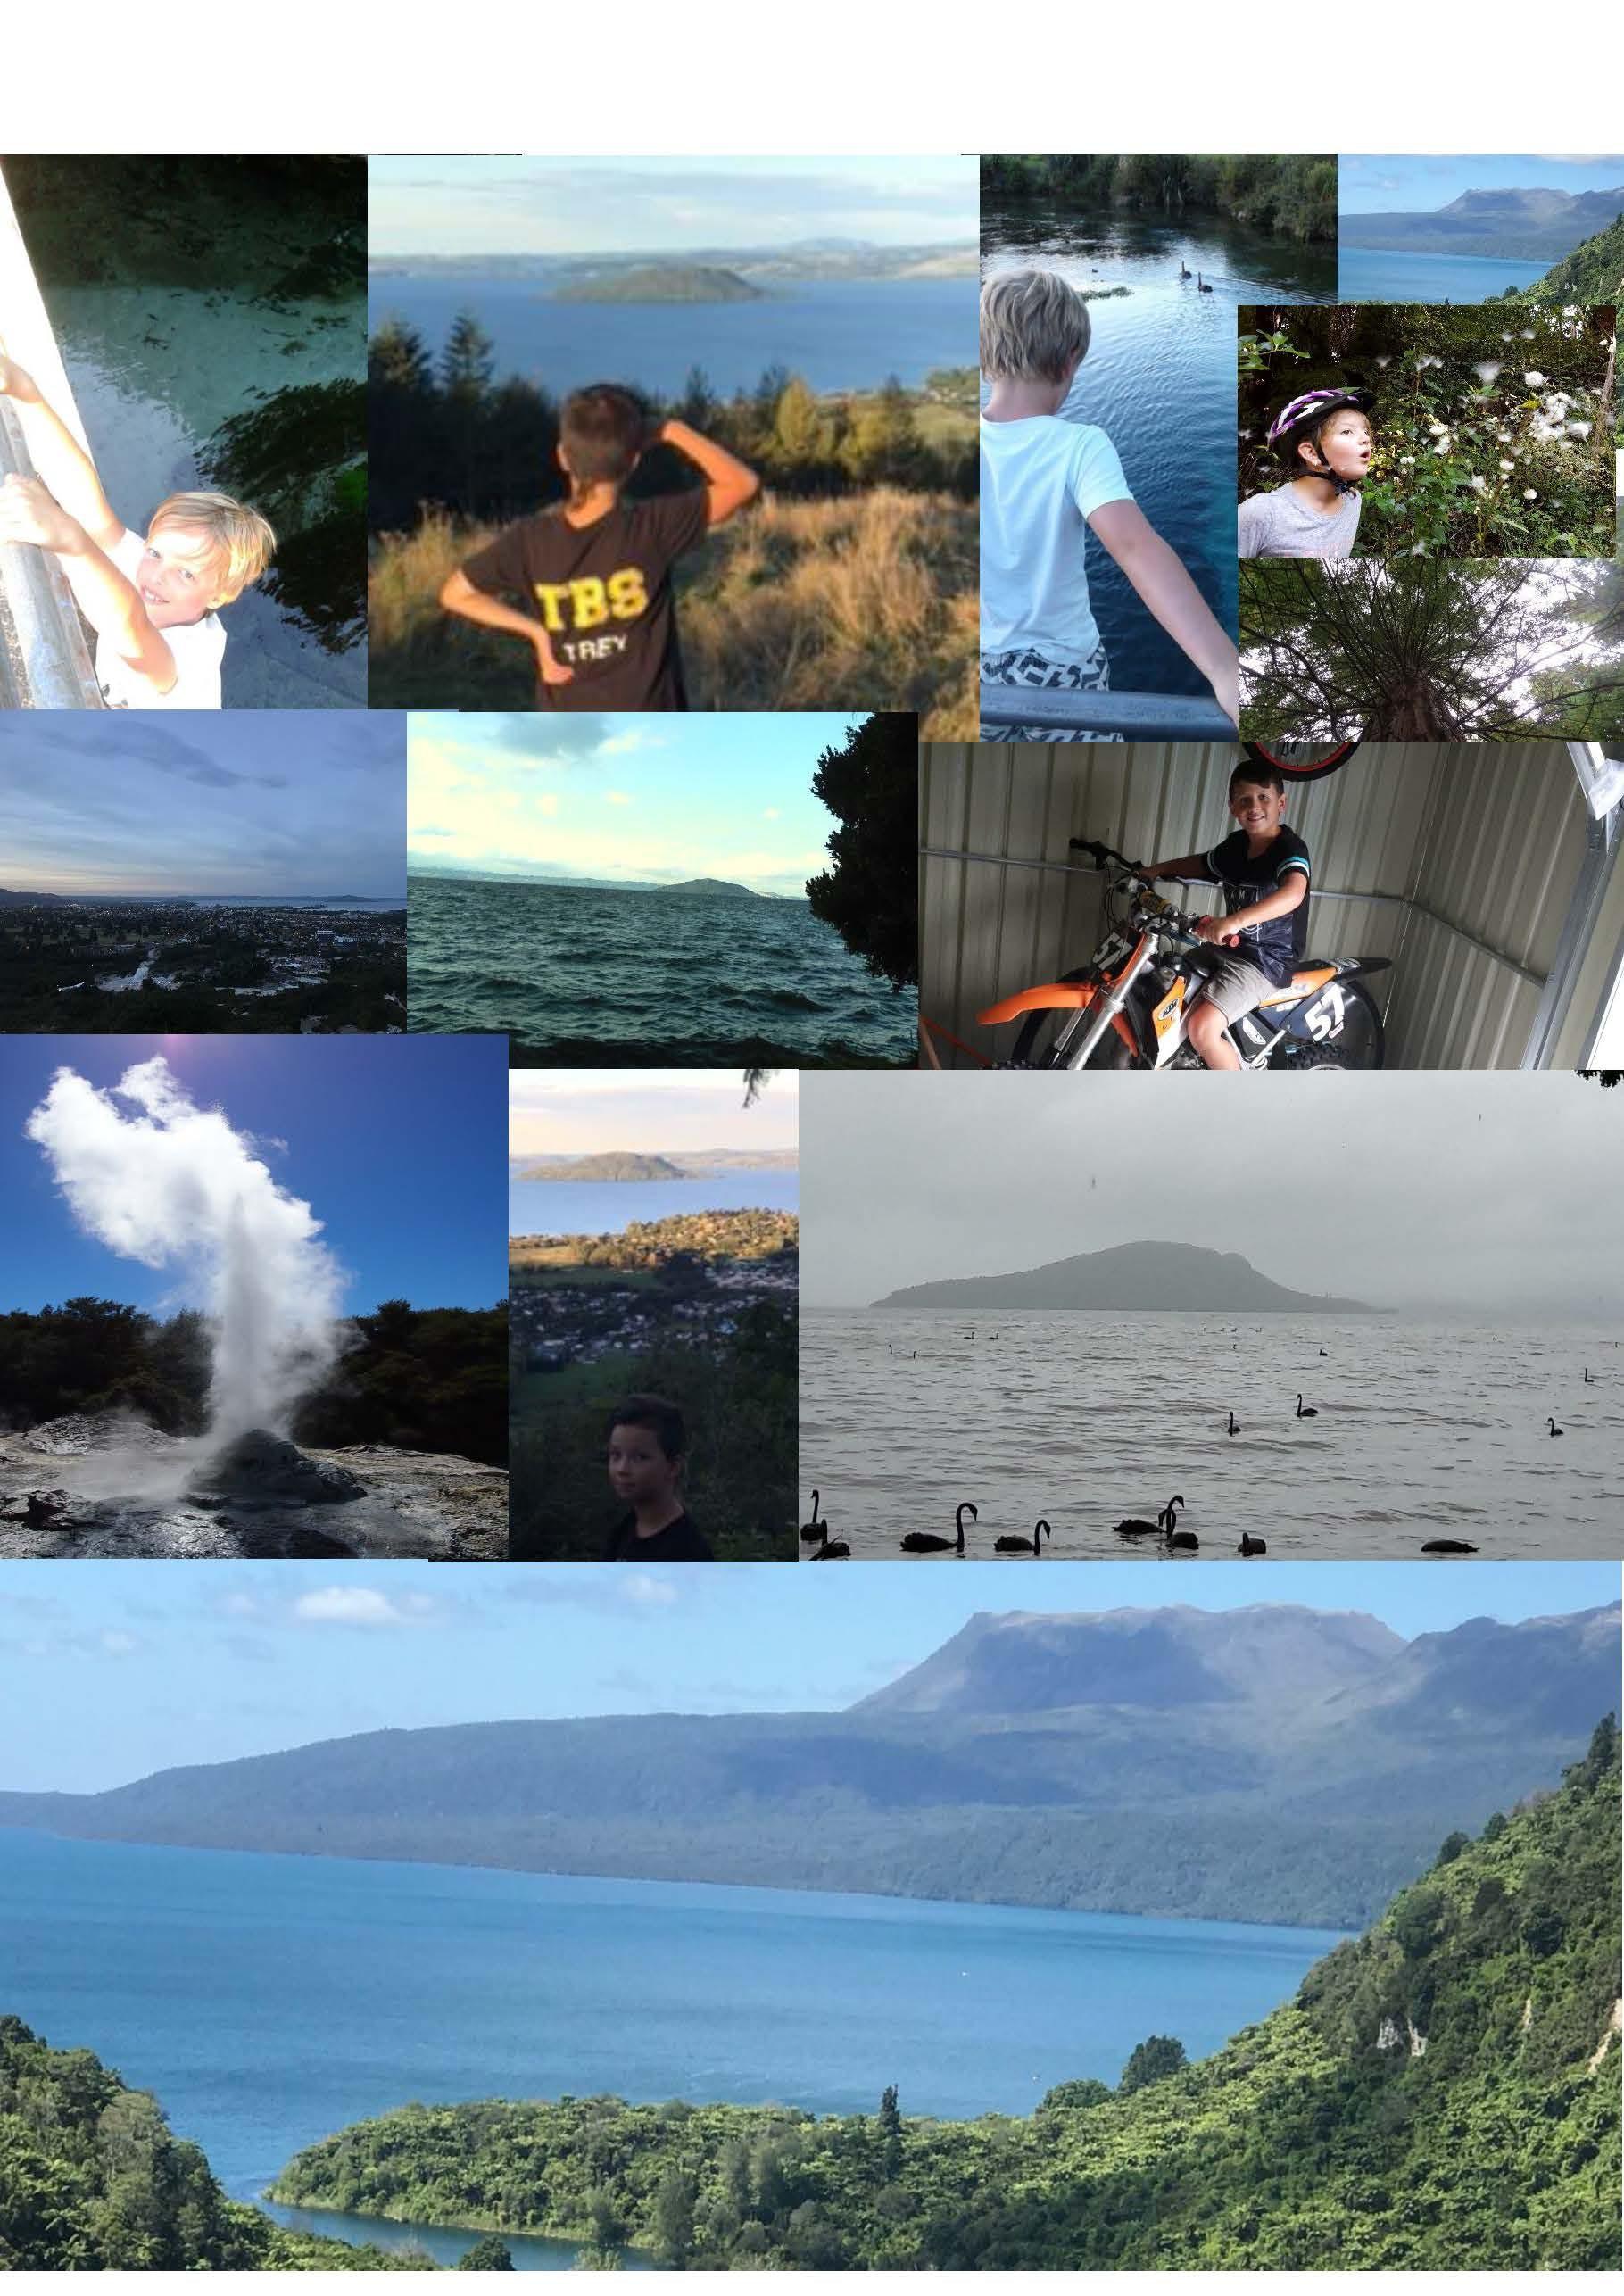 #61 Turangawaewae